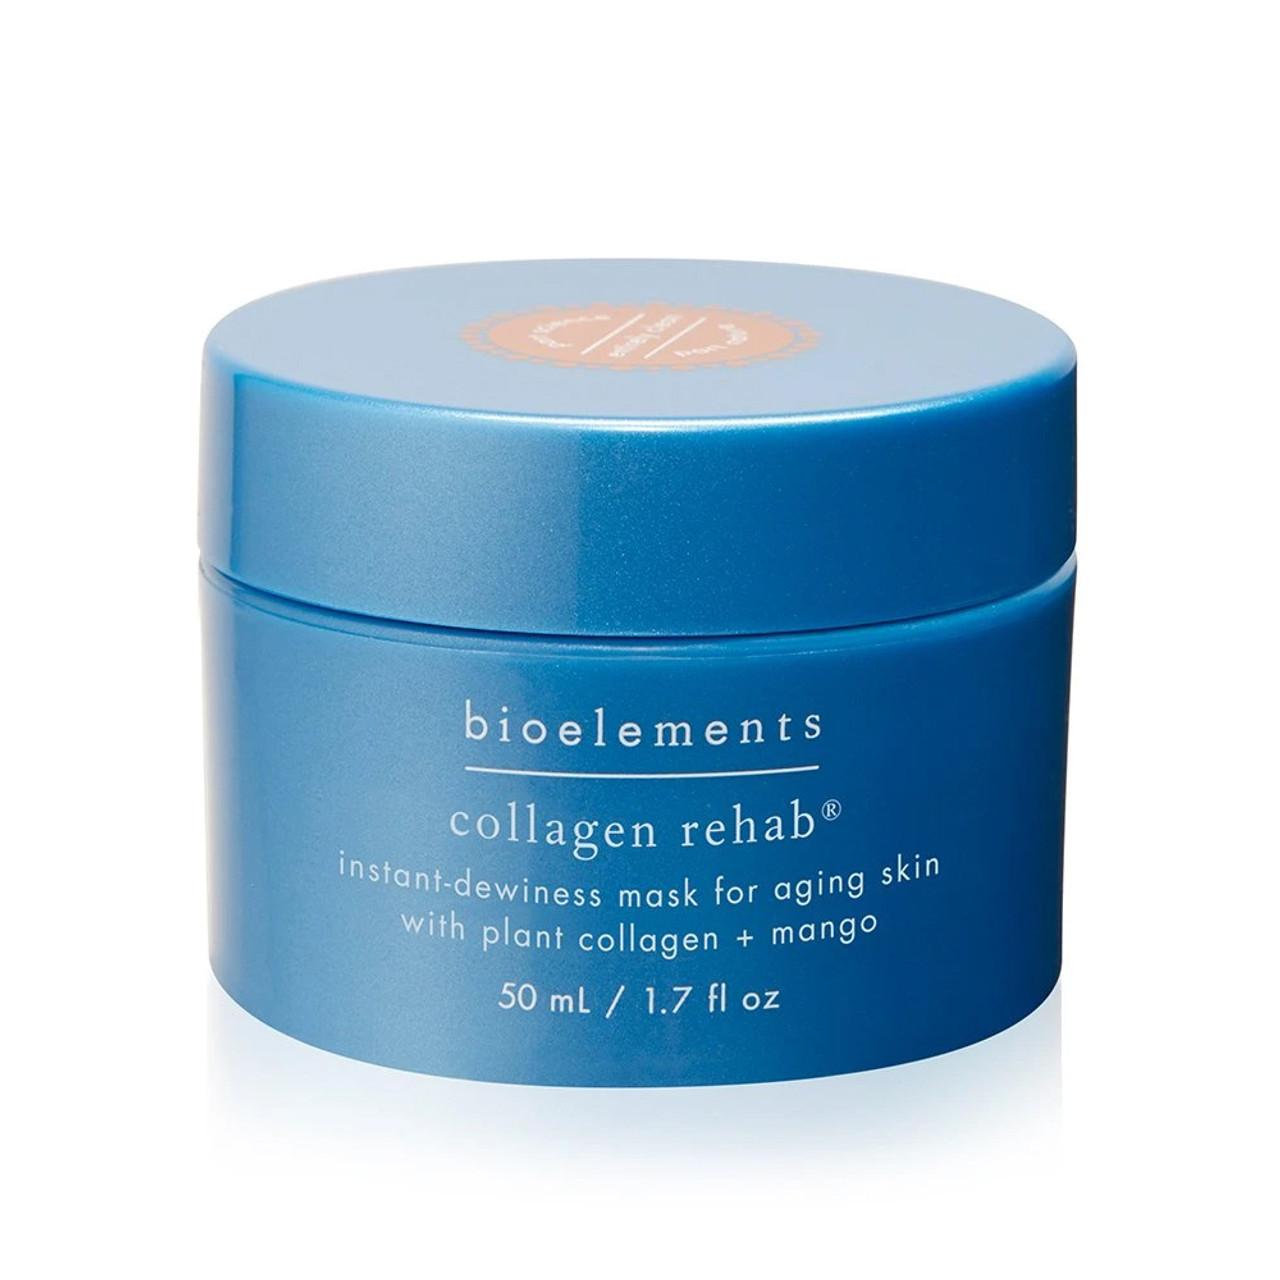 Bioelements Collagen Rehab